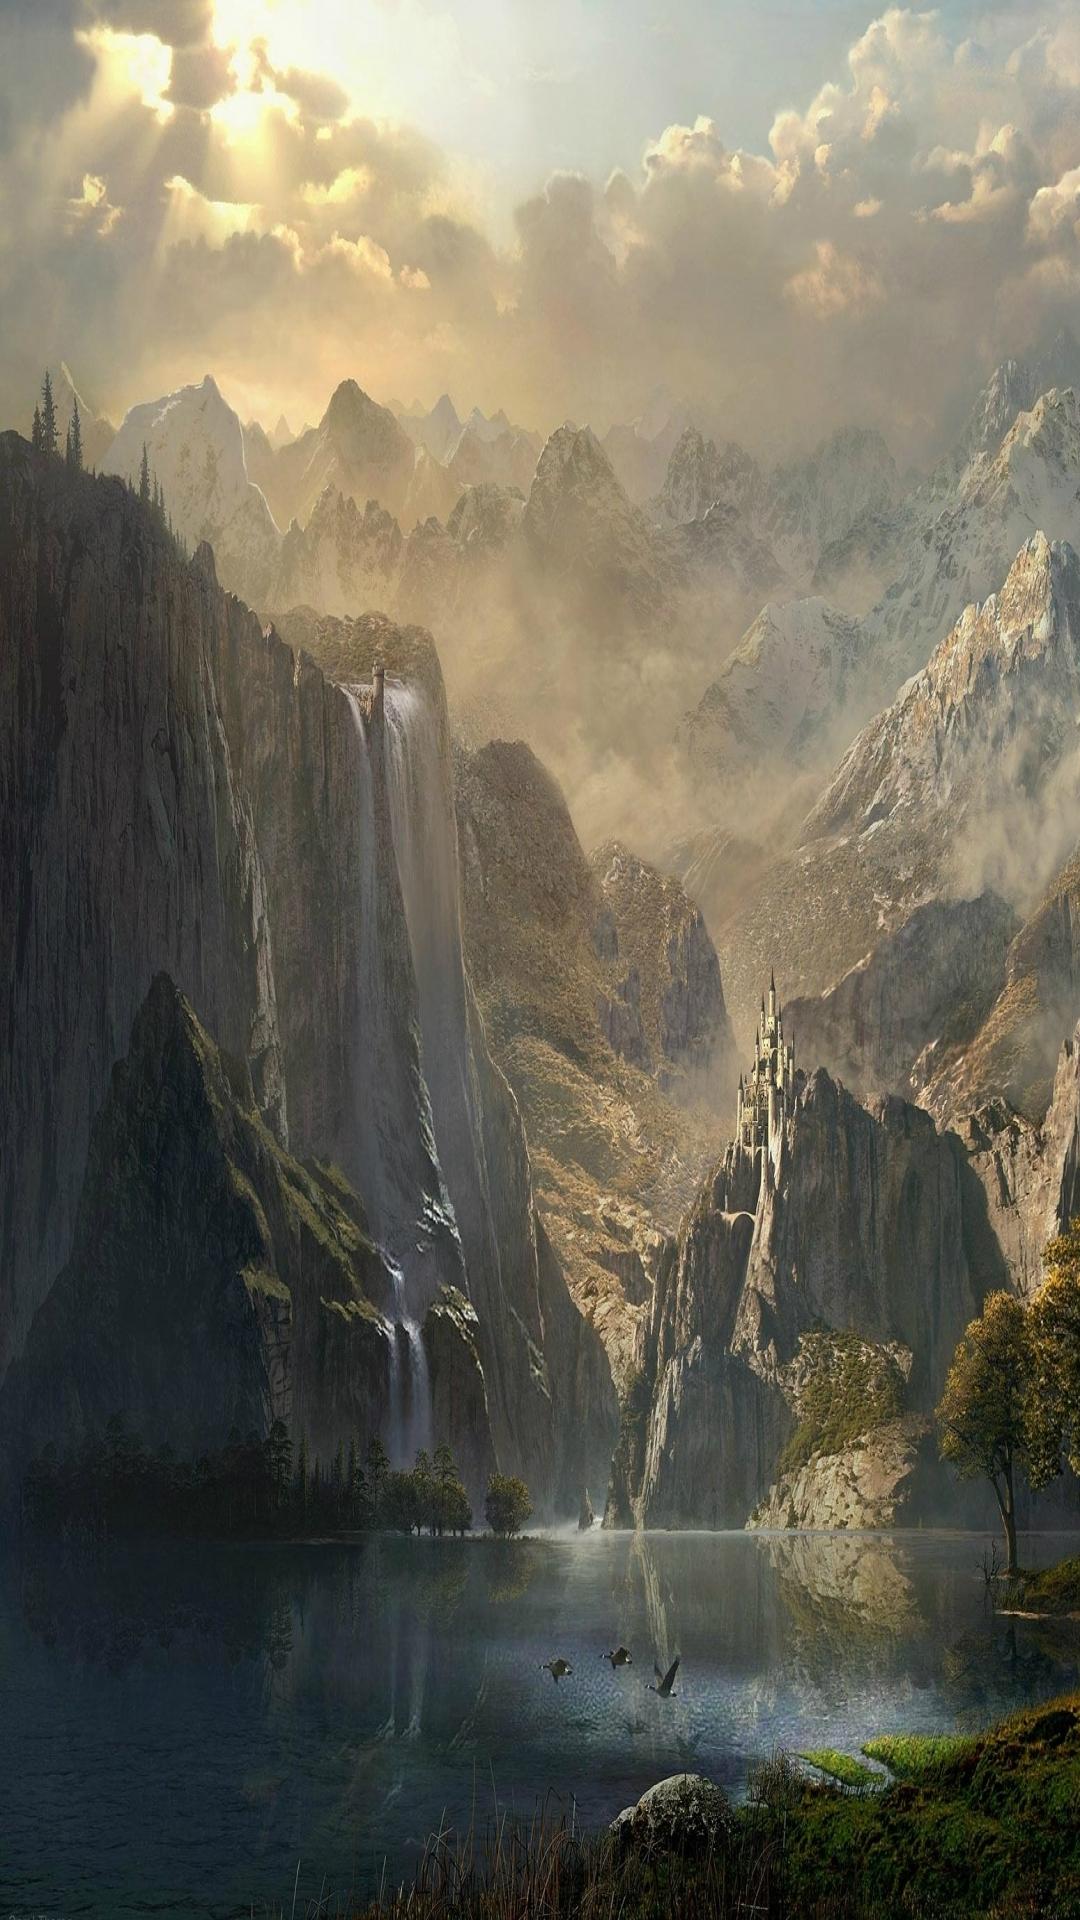 Skyrim Wallpaper Fall Iphone 6 Fantasy Landscape Wallpaper Id 247411